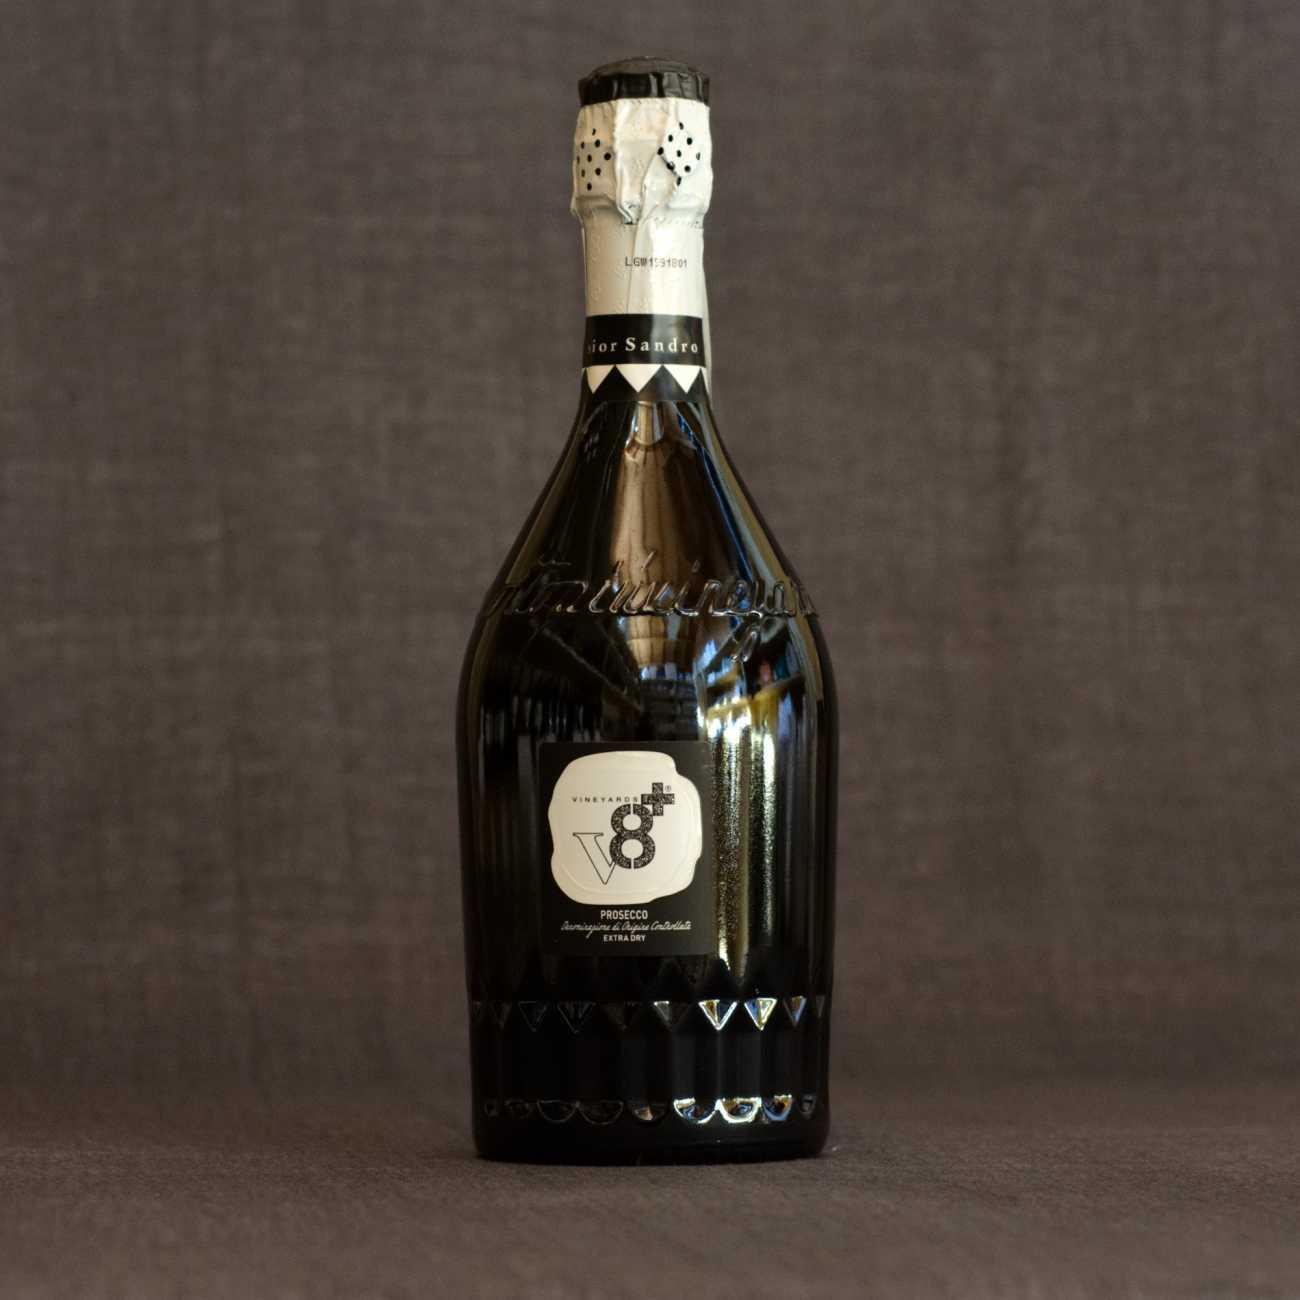 Prosecco V8 D.O.C.G. Sior Sandro - Vini bianchi